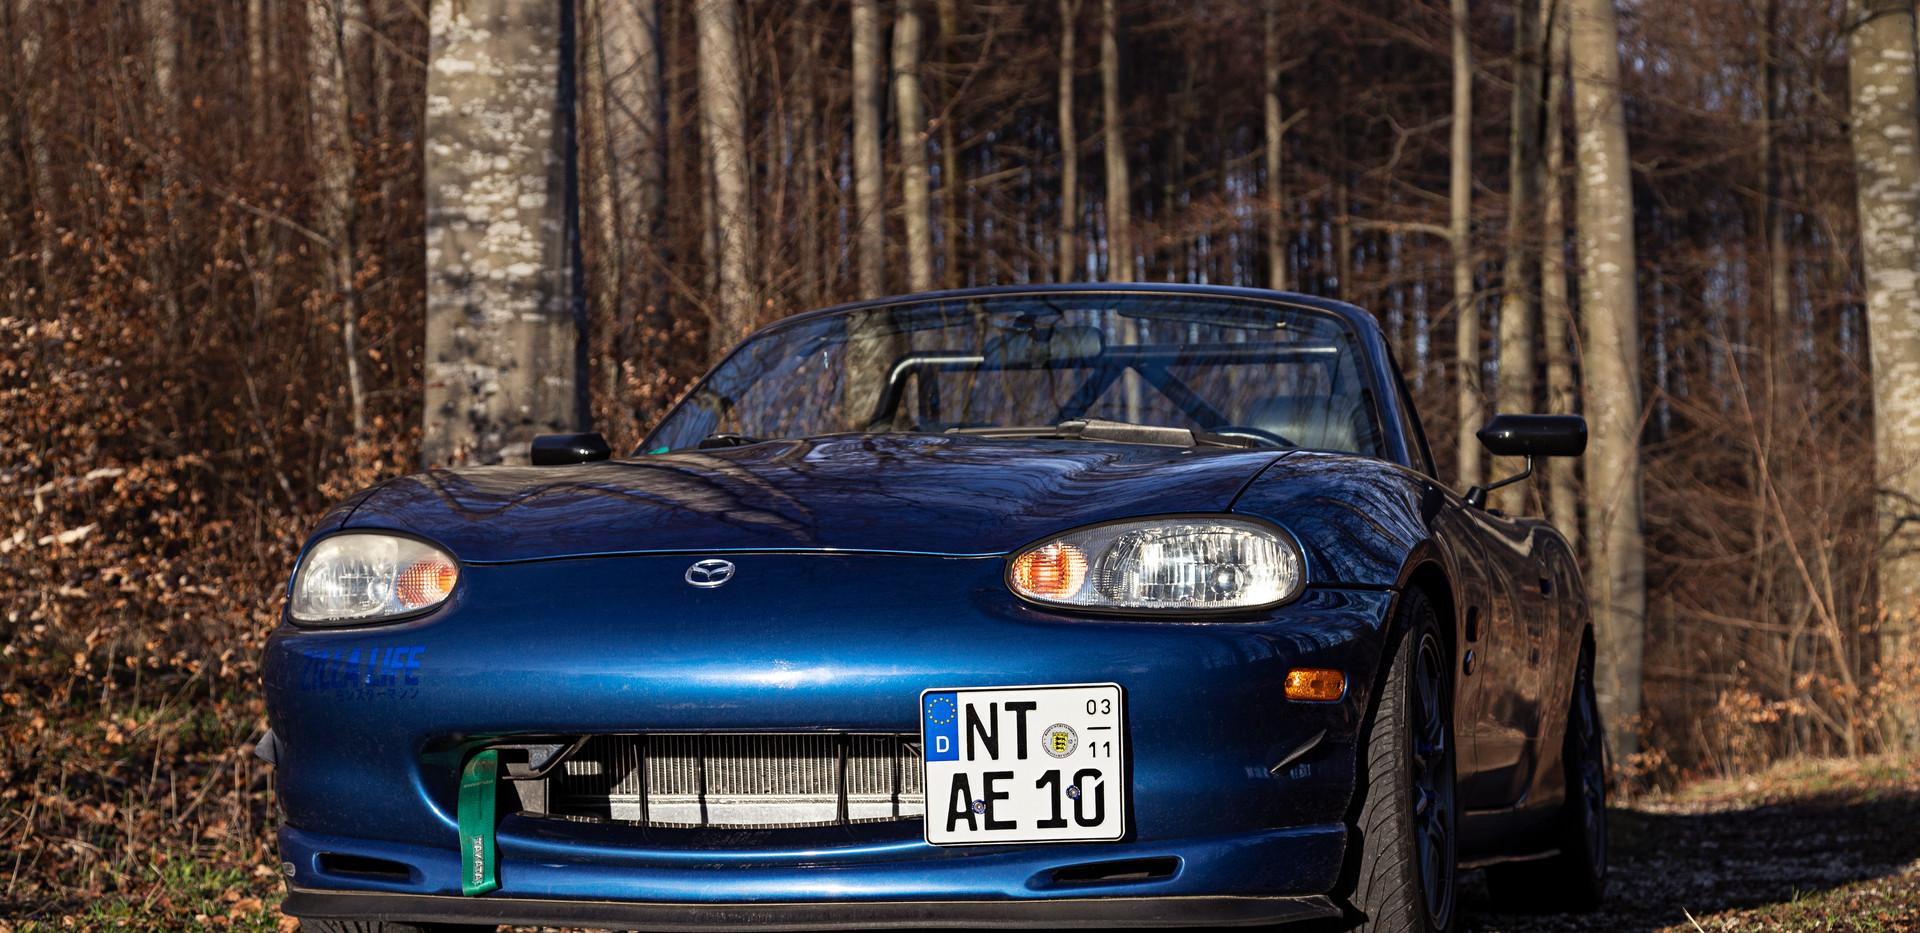 Mazda MX5 - 10th Anniversary